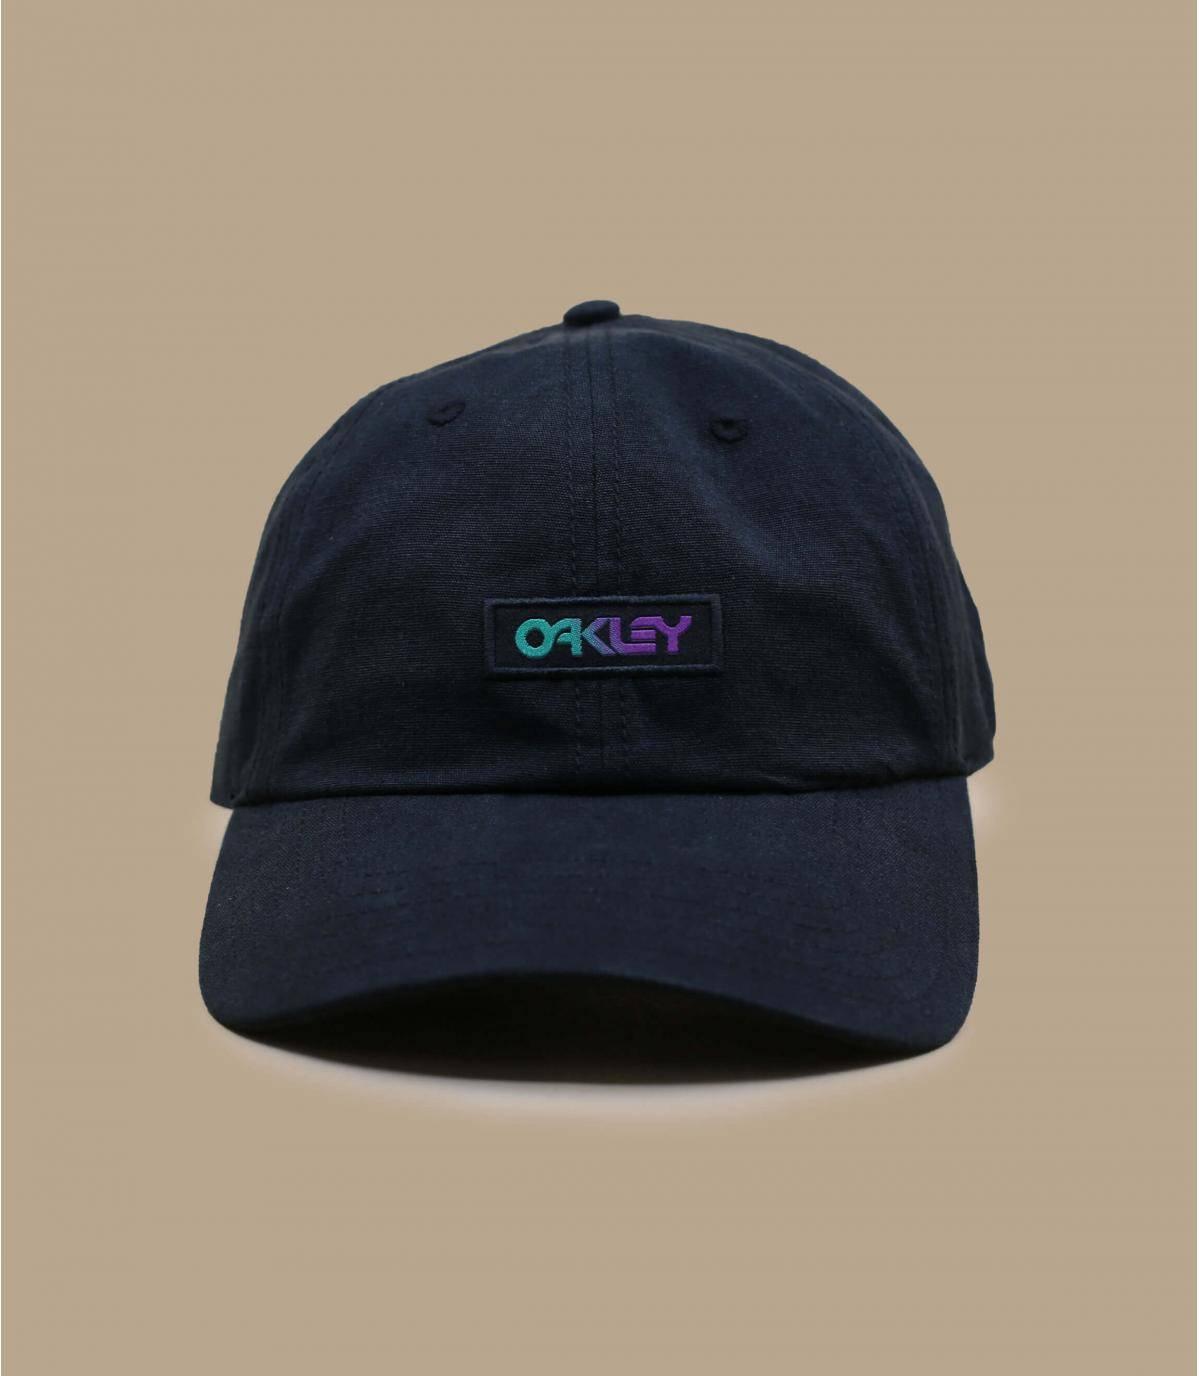 Oakley gebogen cap